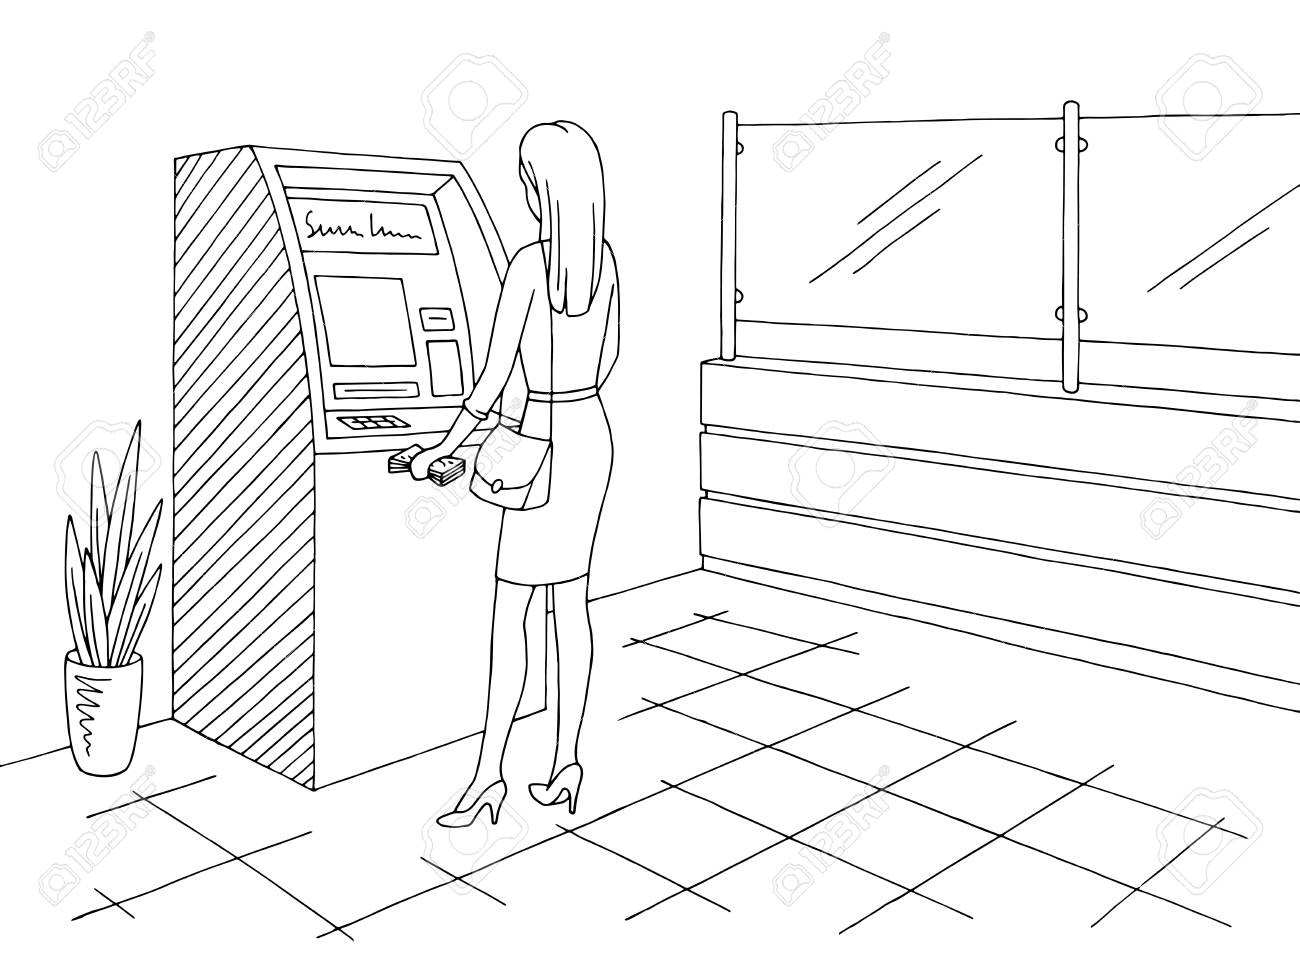 Bank interior graphic black white sketch illustration vector.